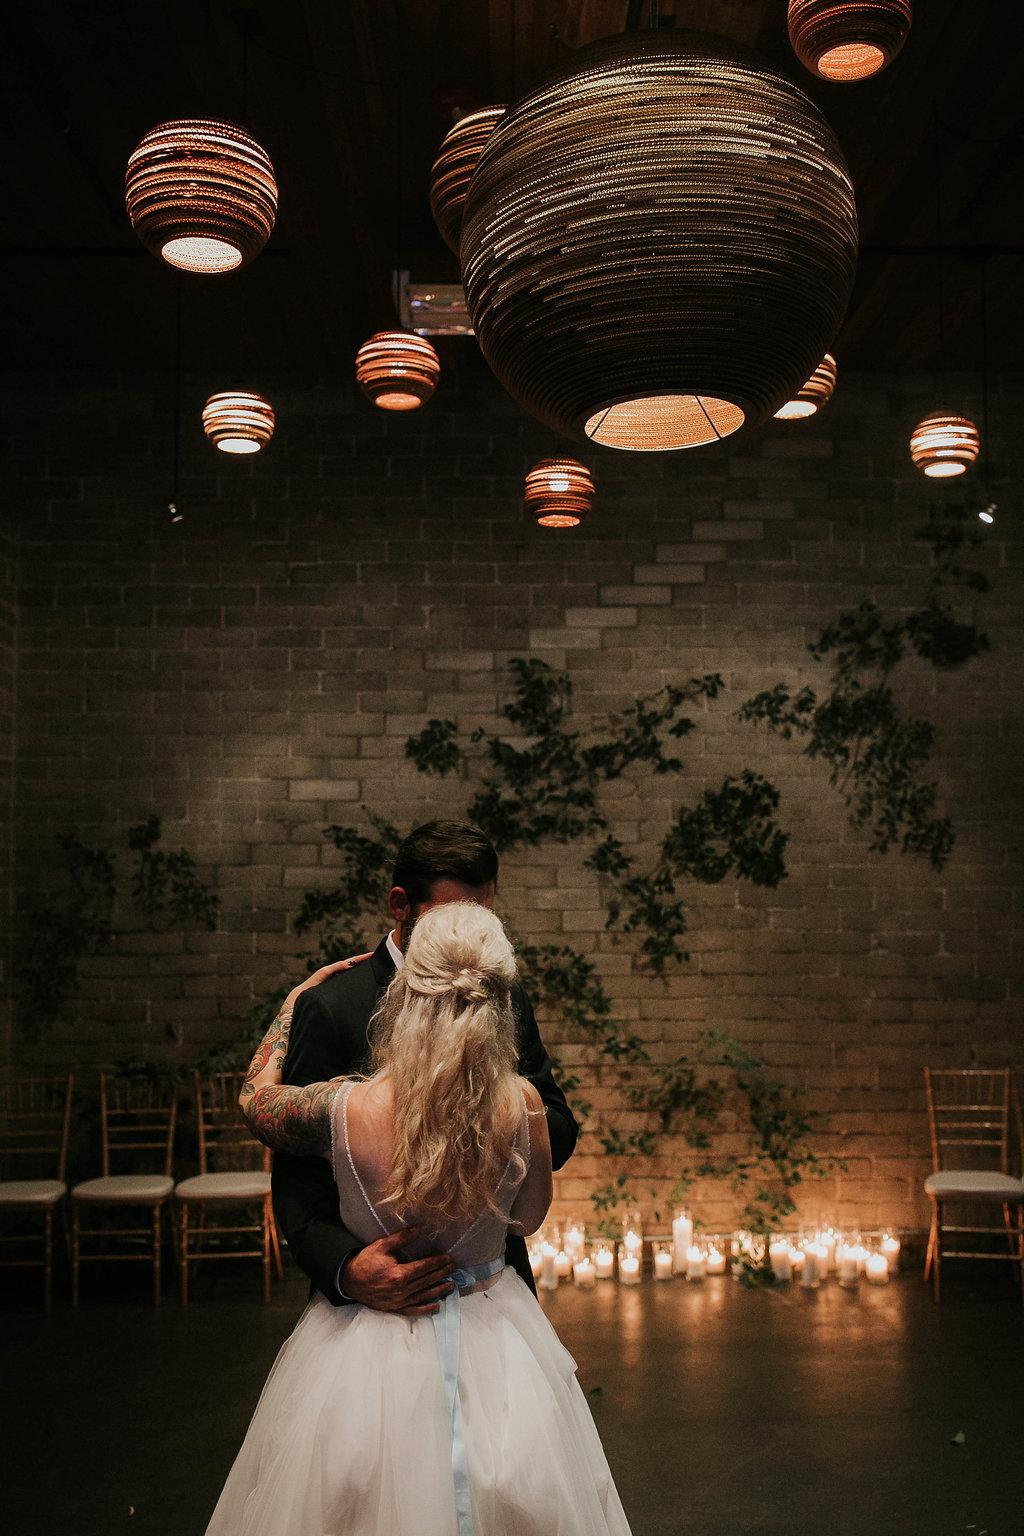 The_Big_Fake_wedding_Seattle_Within_sodo_wedding_by_Adina_Preston_Weddings_466.JPG